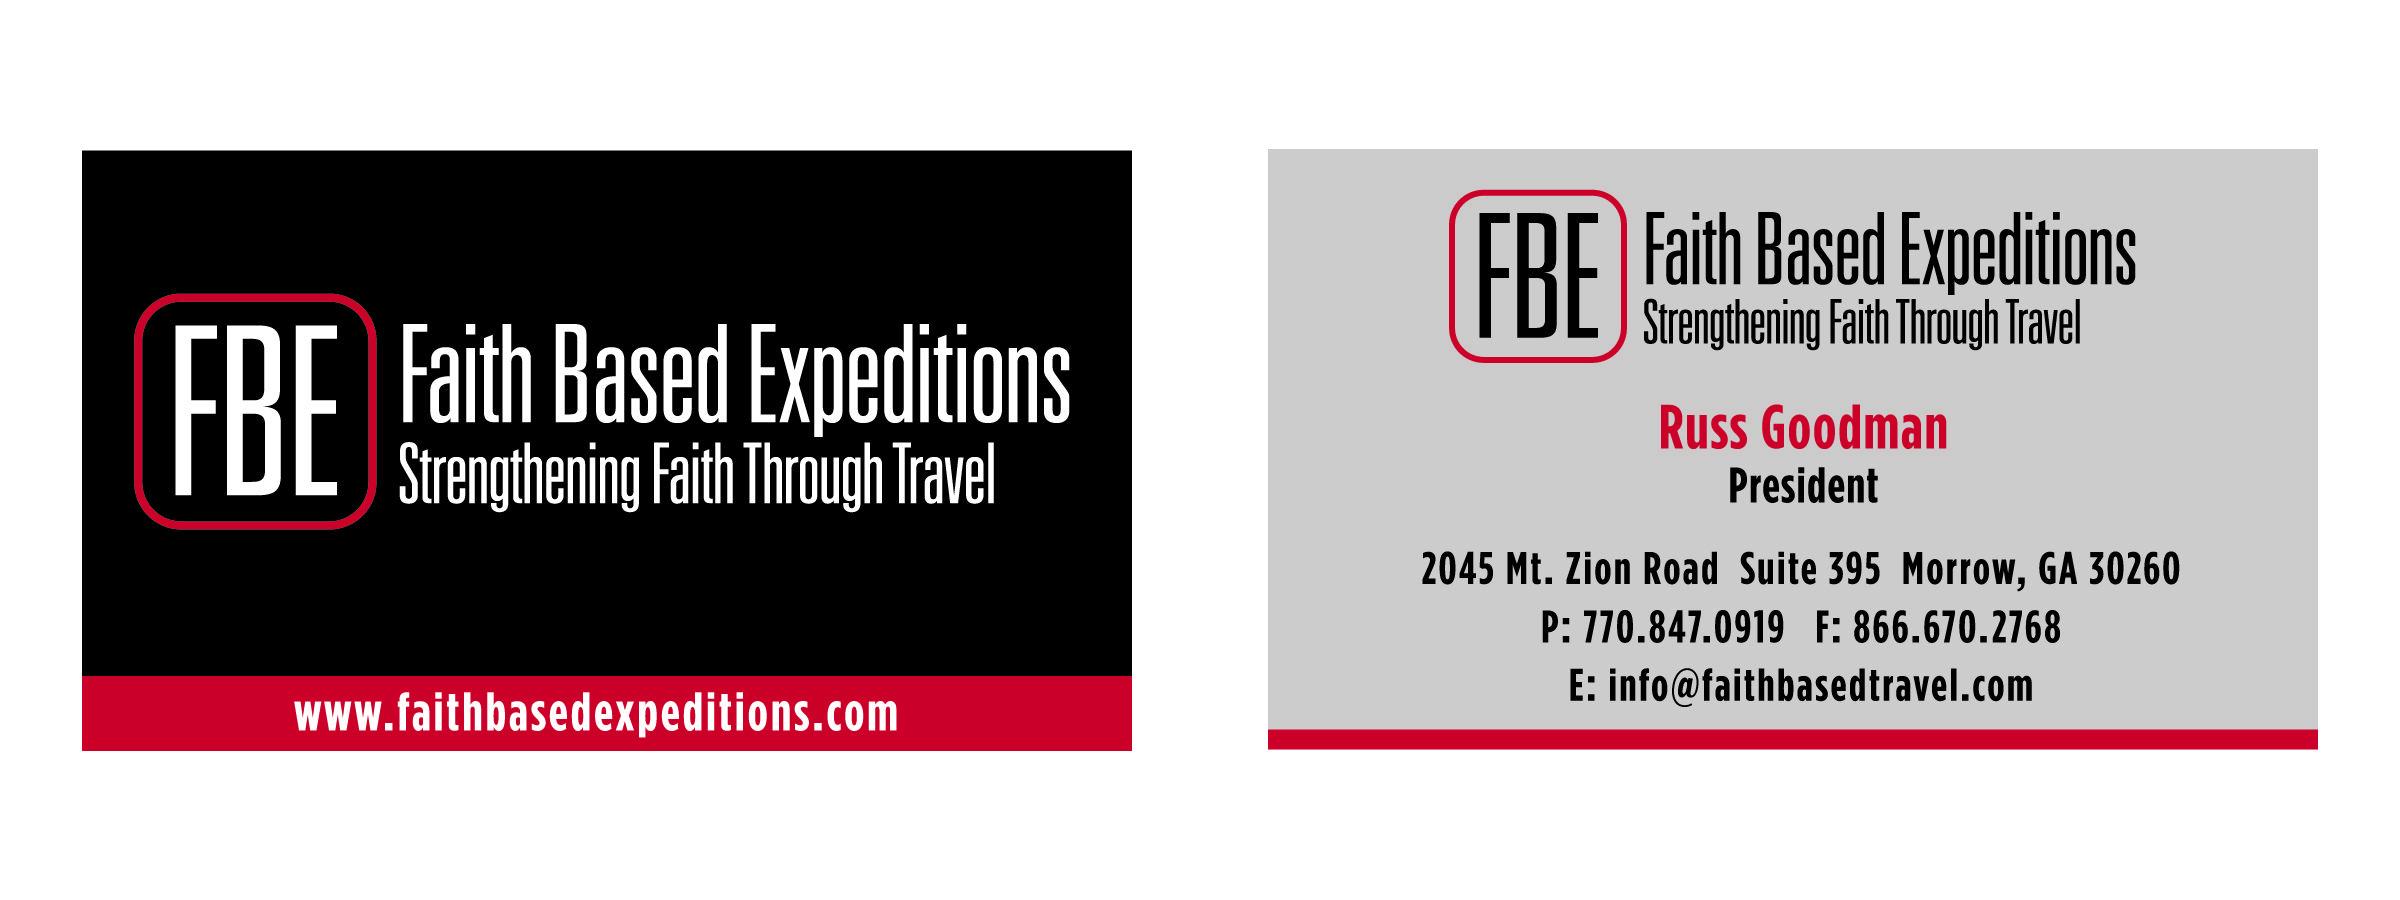 Business card design for Premier Diagnostic Laboratory